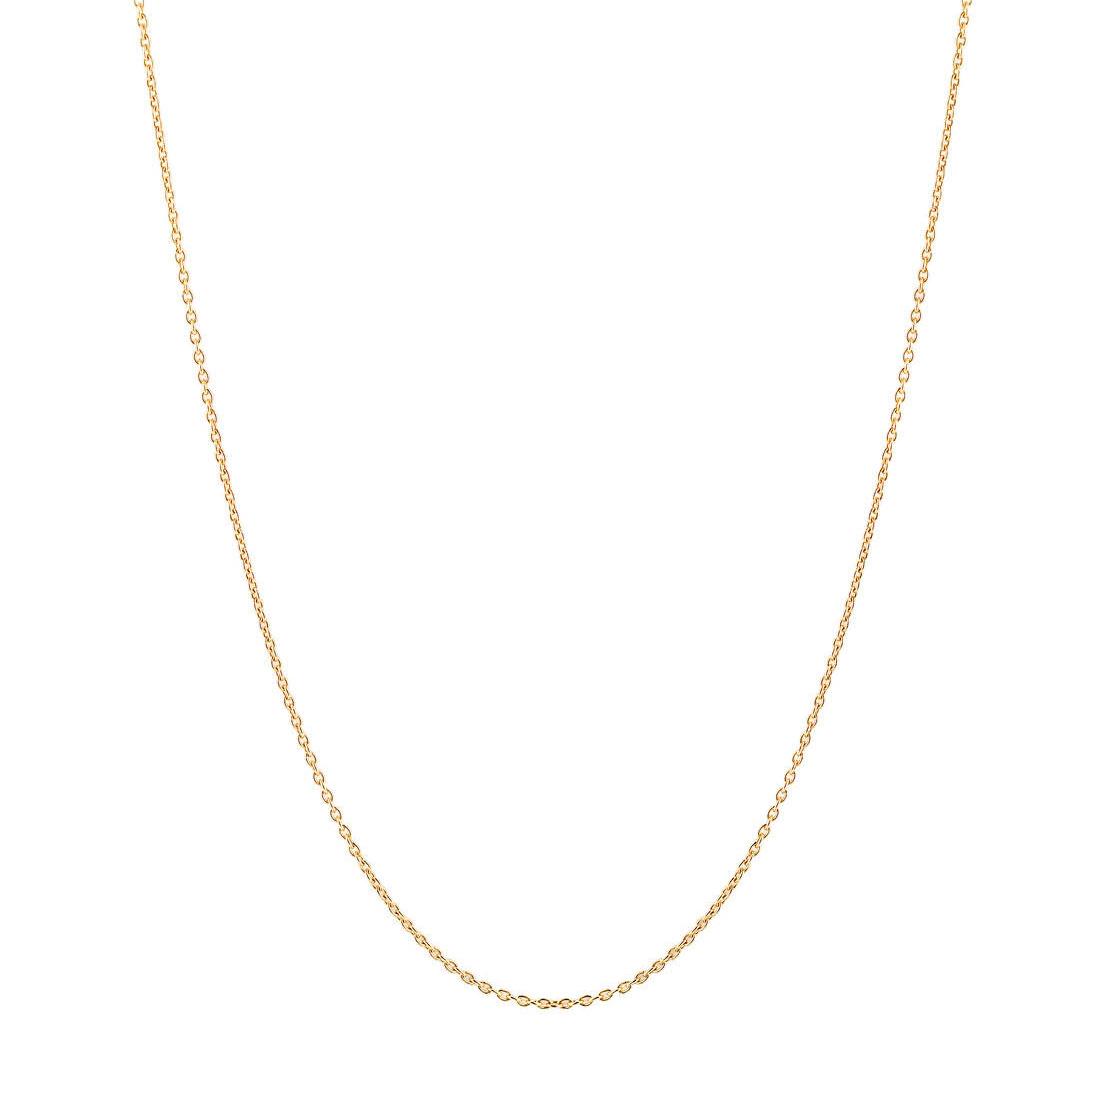 TI SENTO-Milano 3933SY Ketting zilver goudkleurig 90 cm